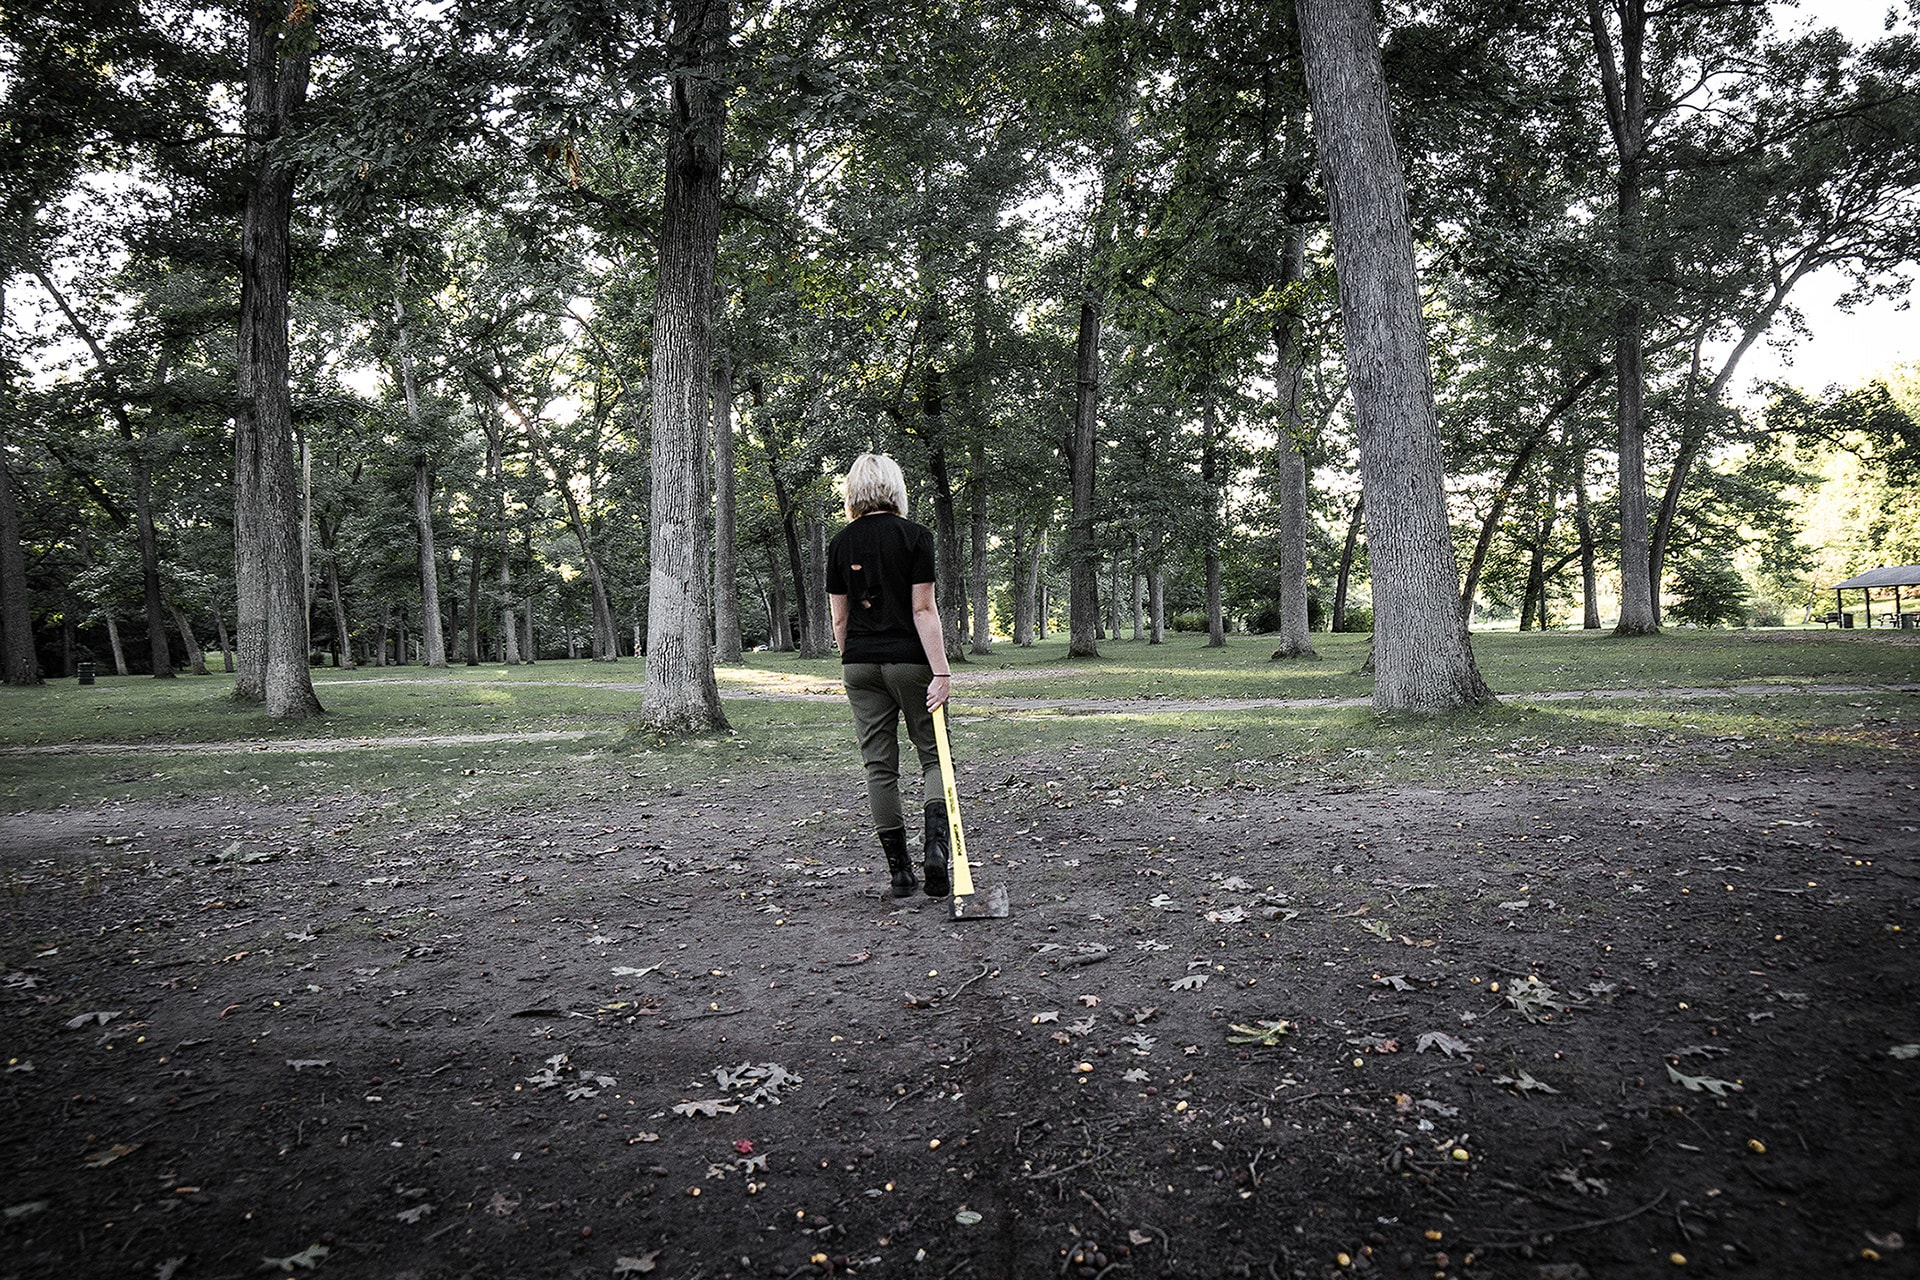 simpson-h-woods-creep-1-iphone-8-min.jpg